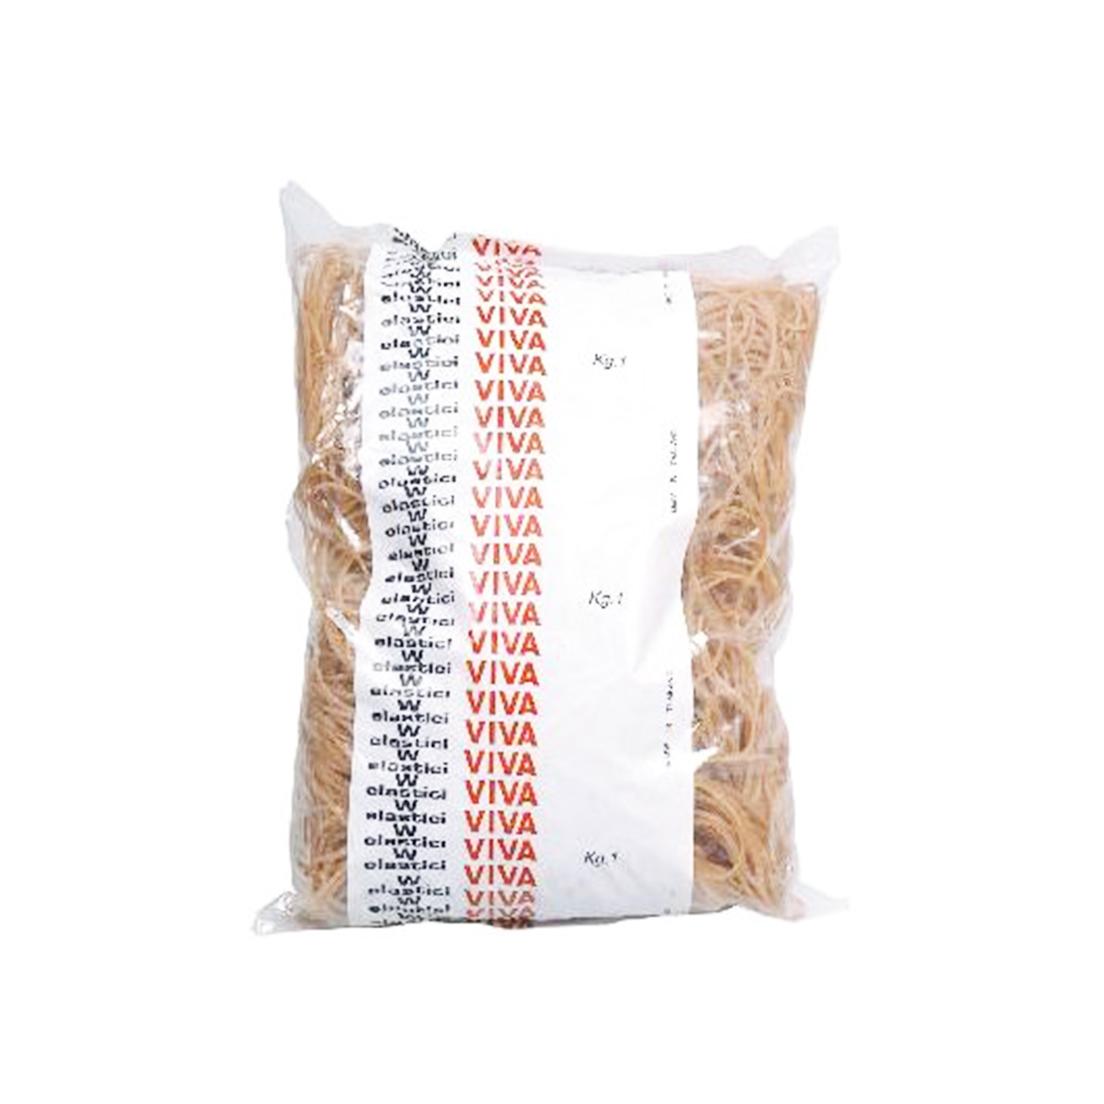 ELASTICI PARA IN BUSTA 40mm 1kg